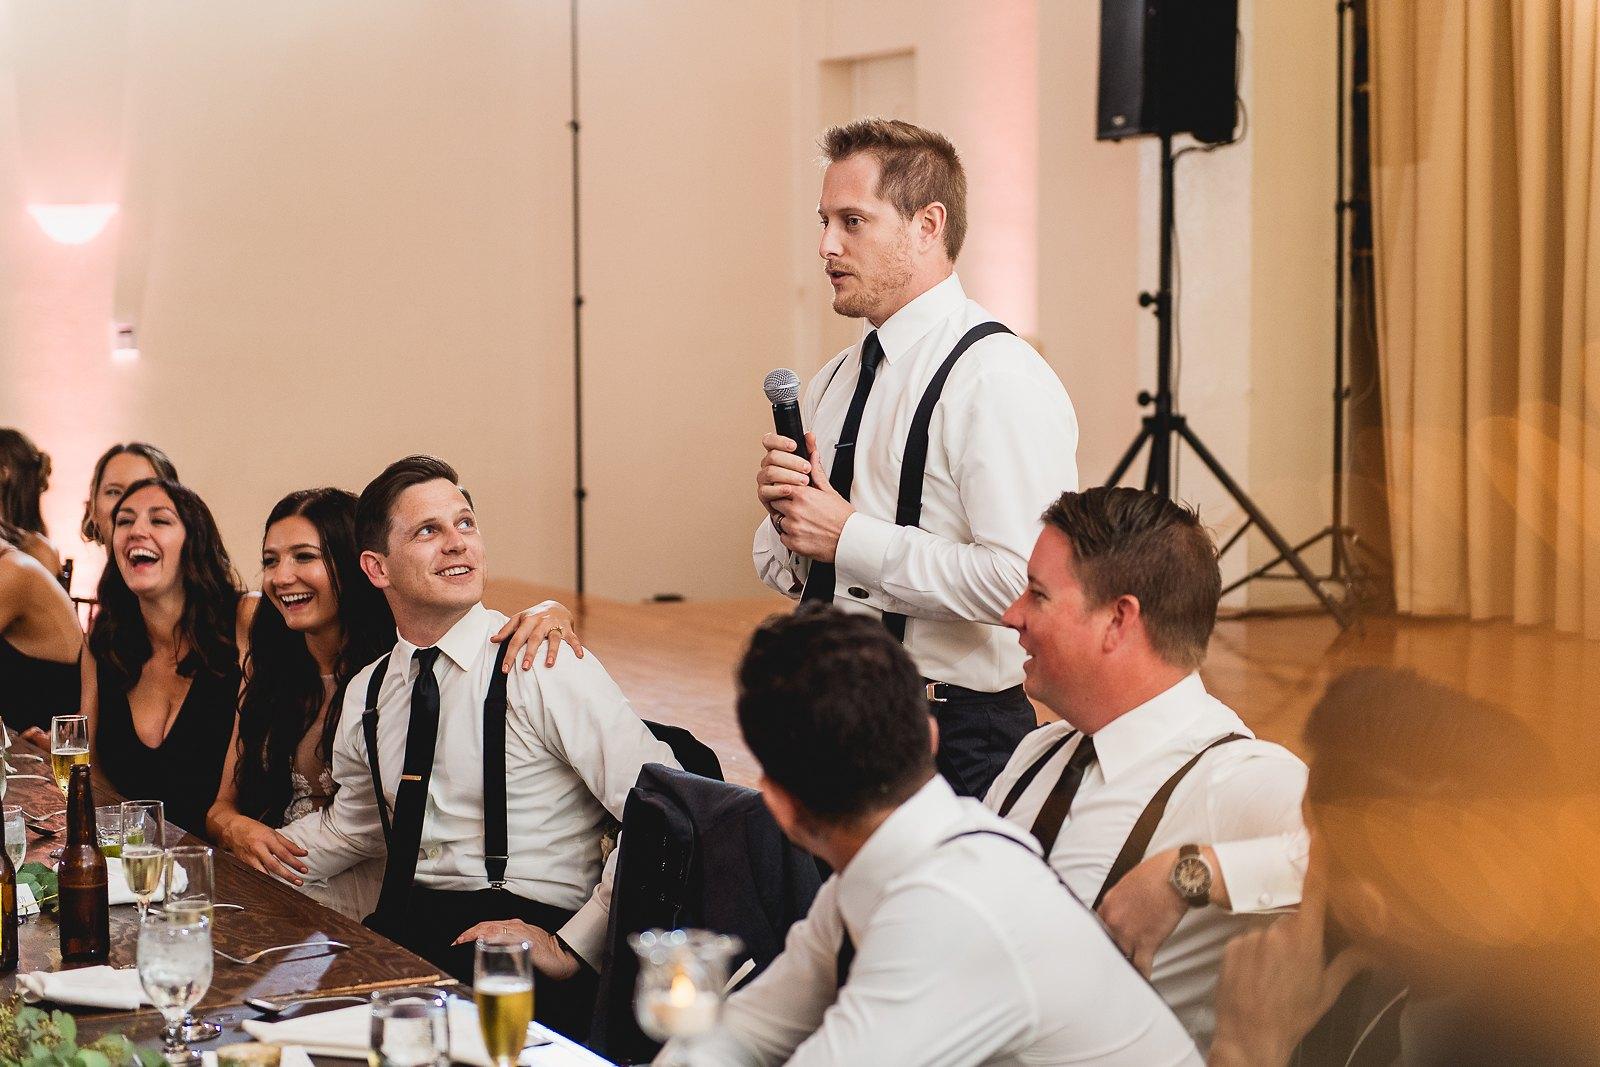 La-jolla-womans-club-wedding-photos